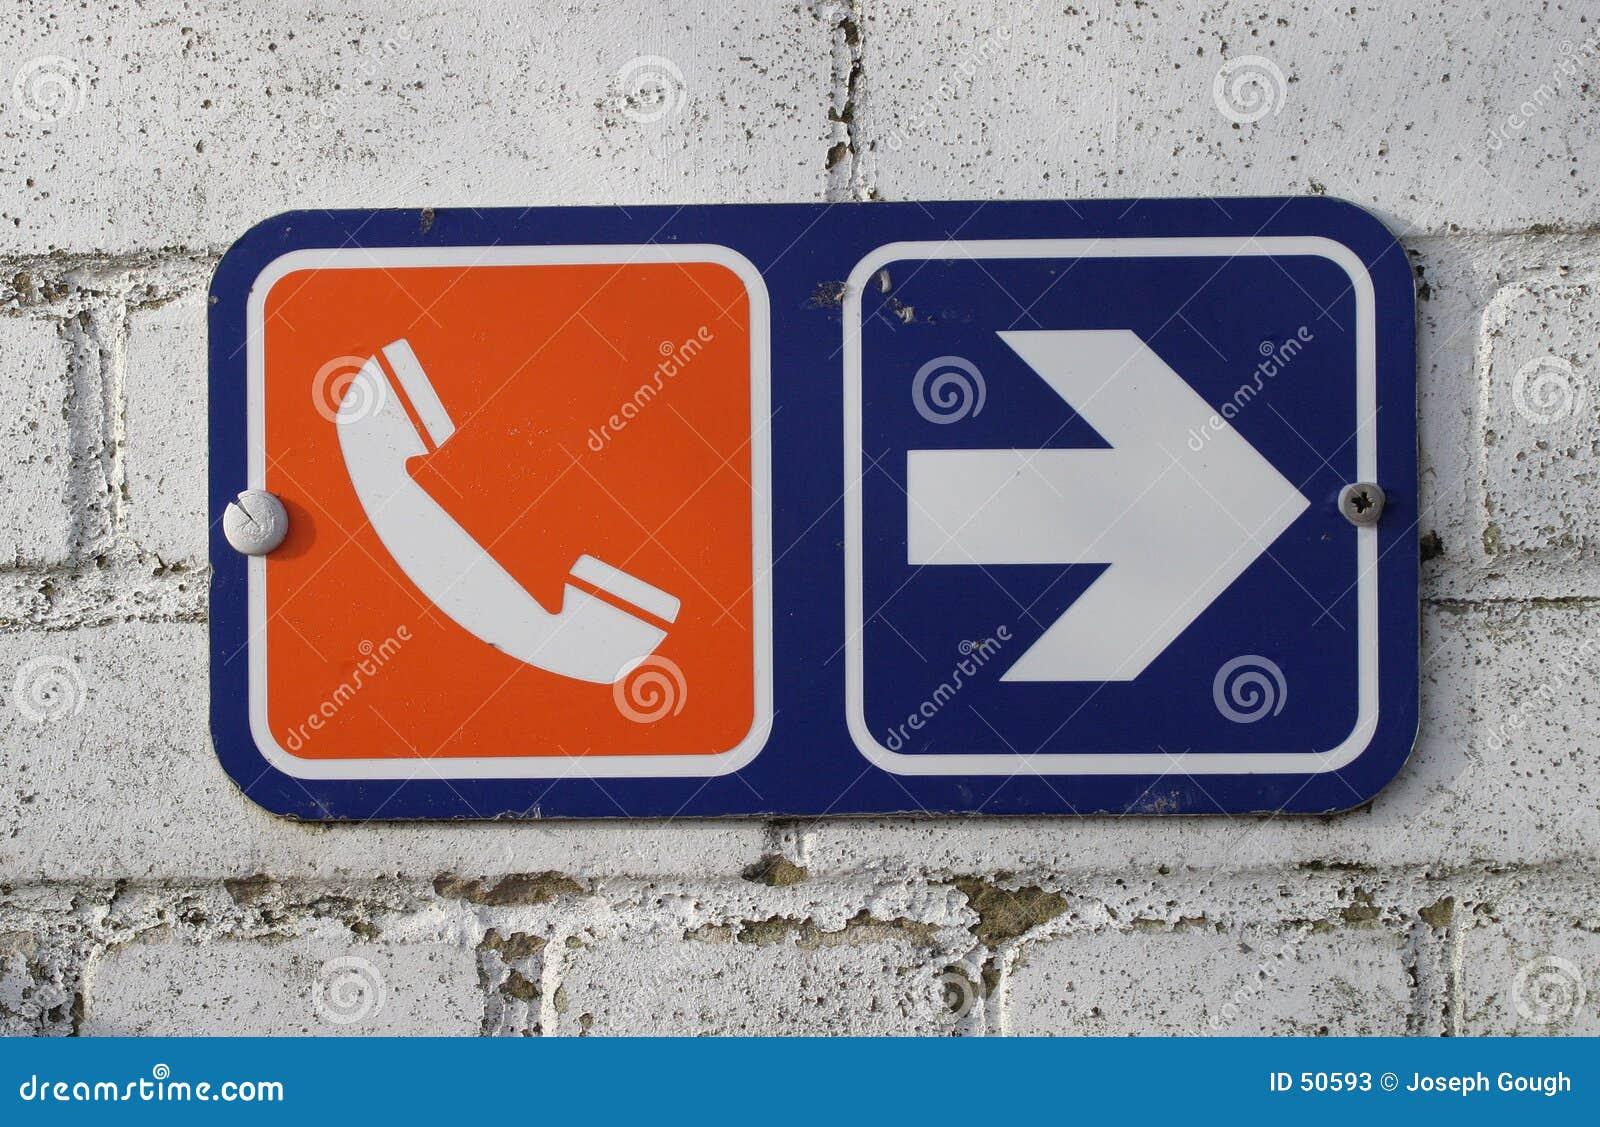 Assine, telefone